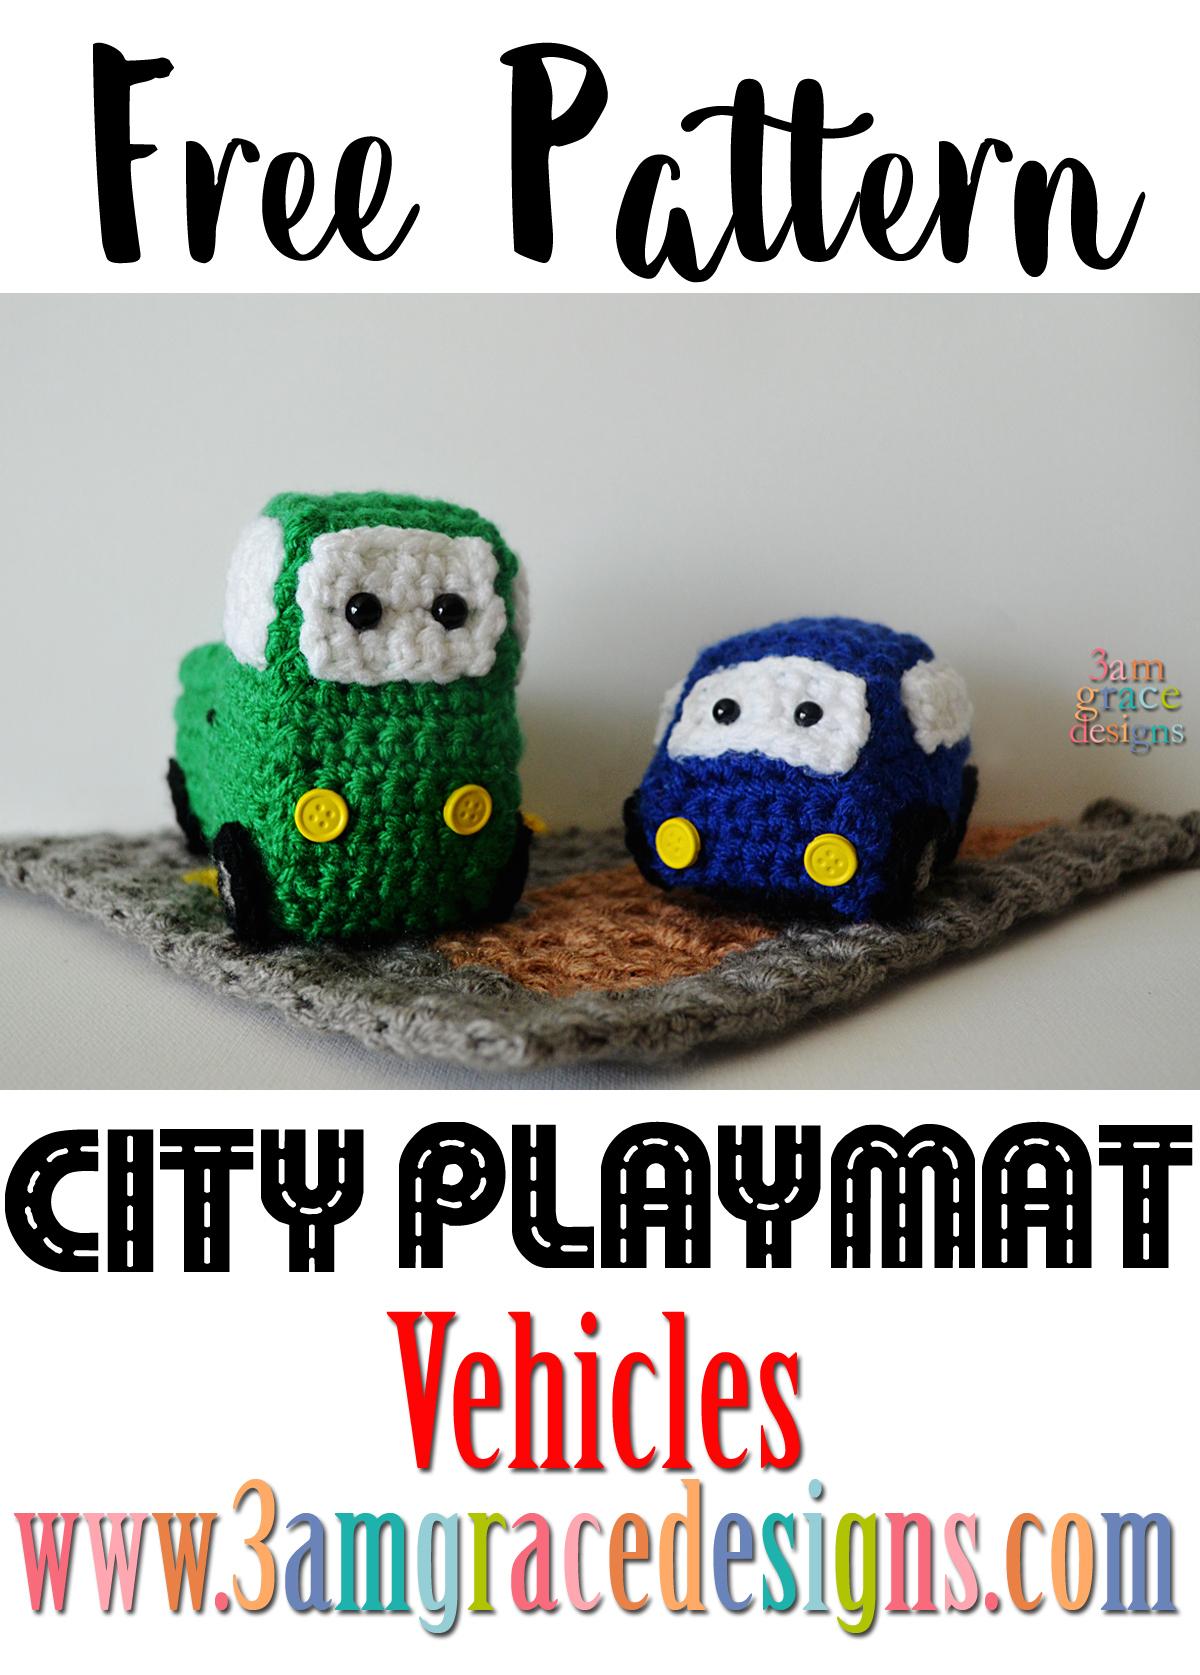 Cute and Cuddly Crochet Car Patterns! | Patrones amigurumi ... | 1675x1200